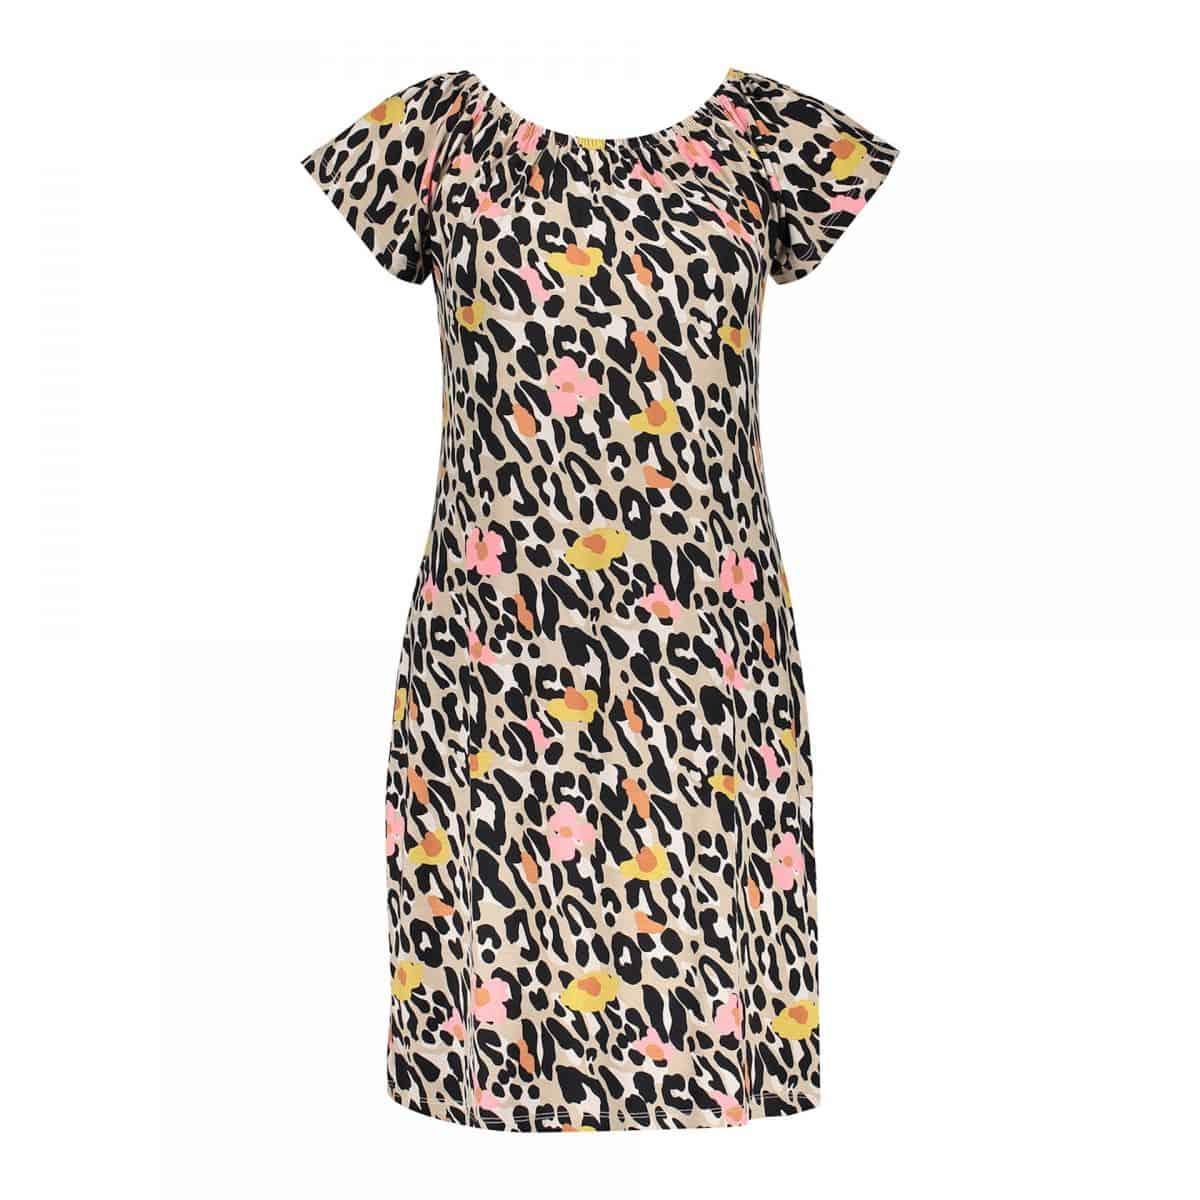 Geisha Dress Elastic Neck S/S Leopard Beige